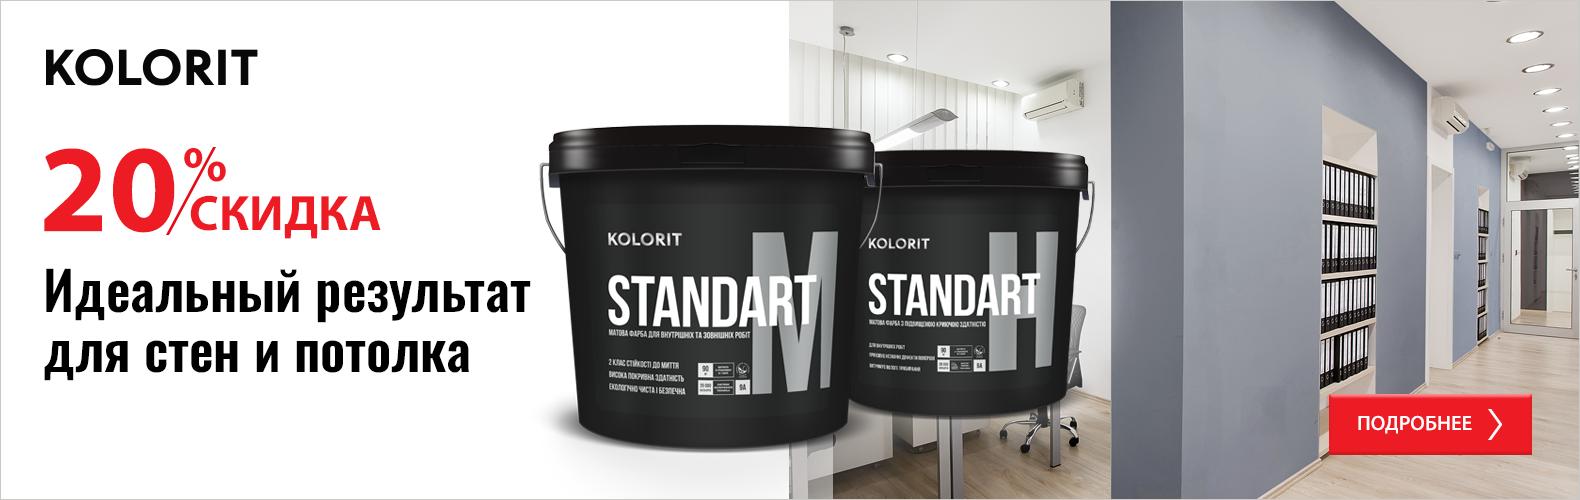 Kolorit Standart H_M